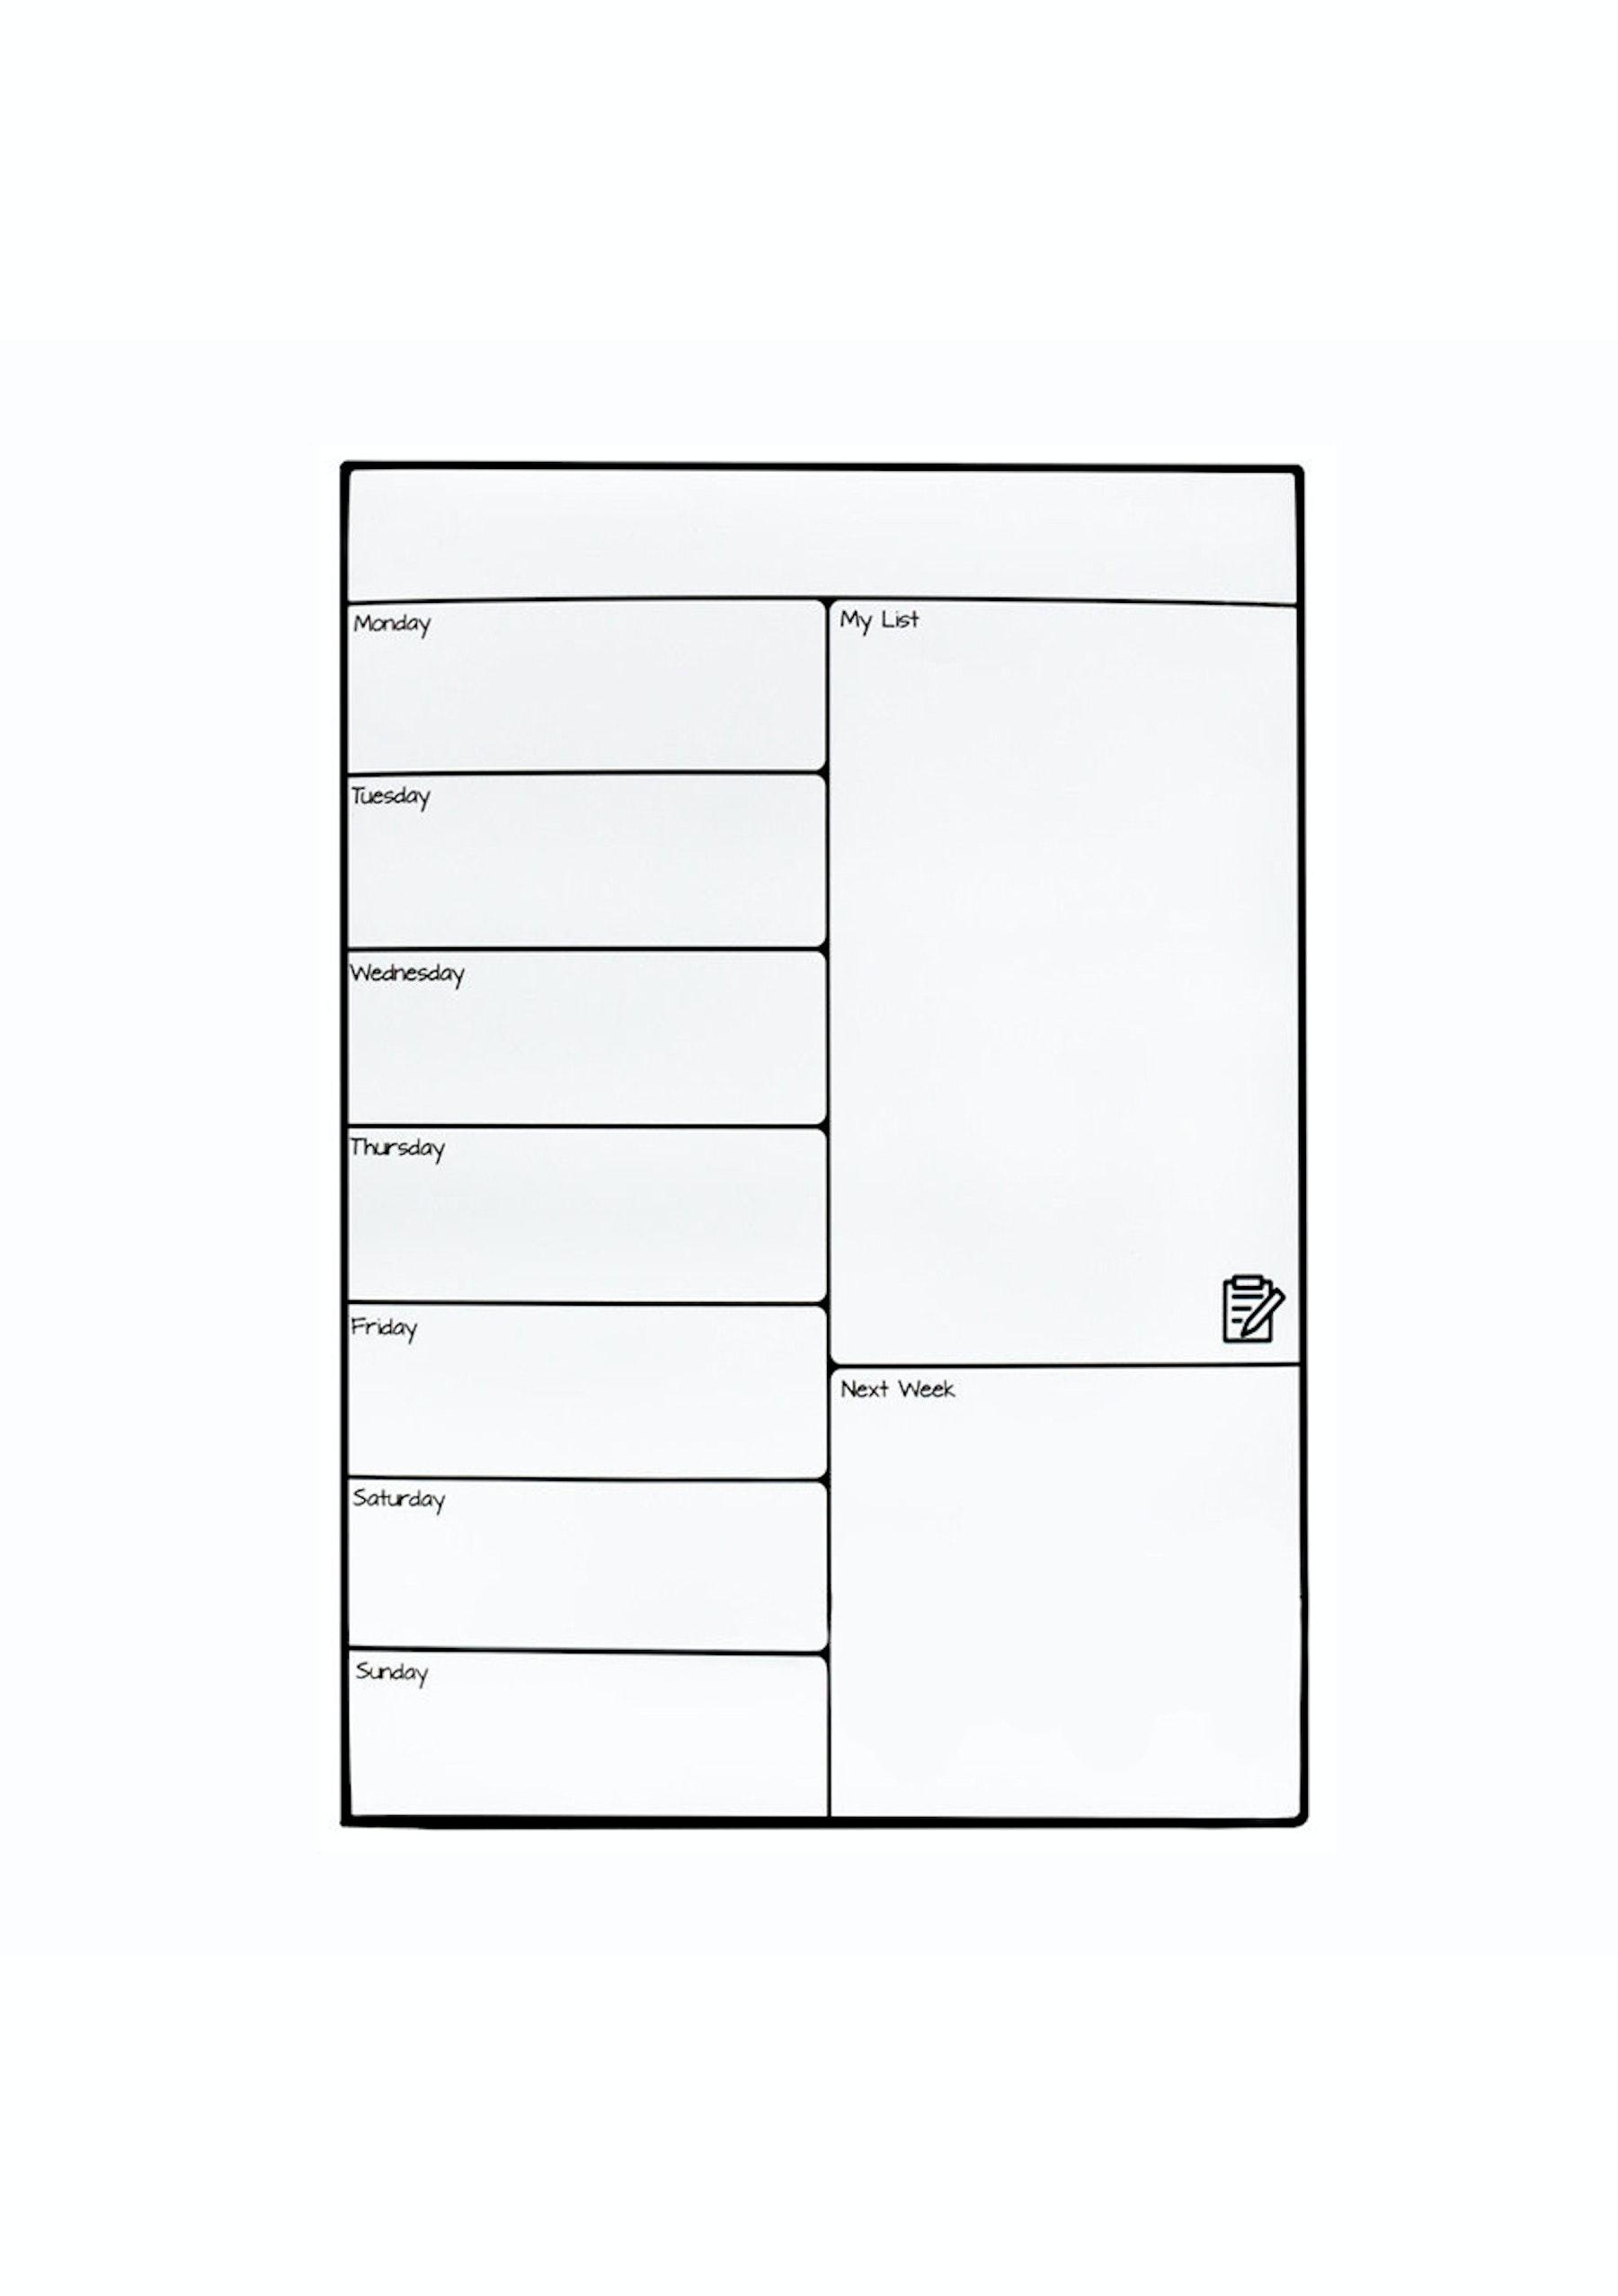 Magnetic Dry Erase Calendar Weekly Board For Fridge Under 20 Home